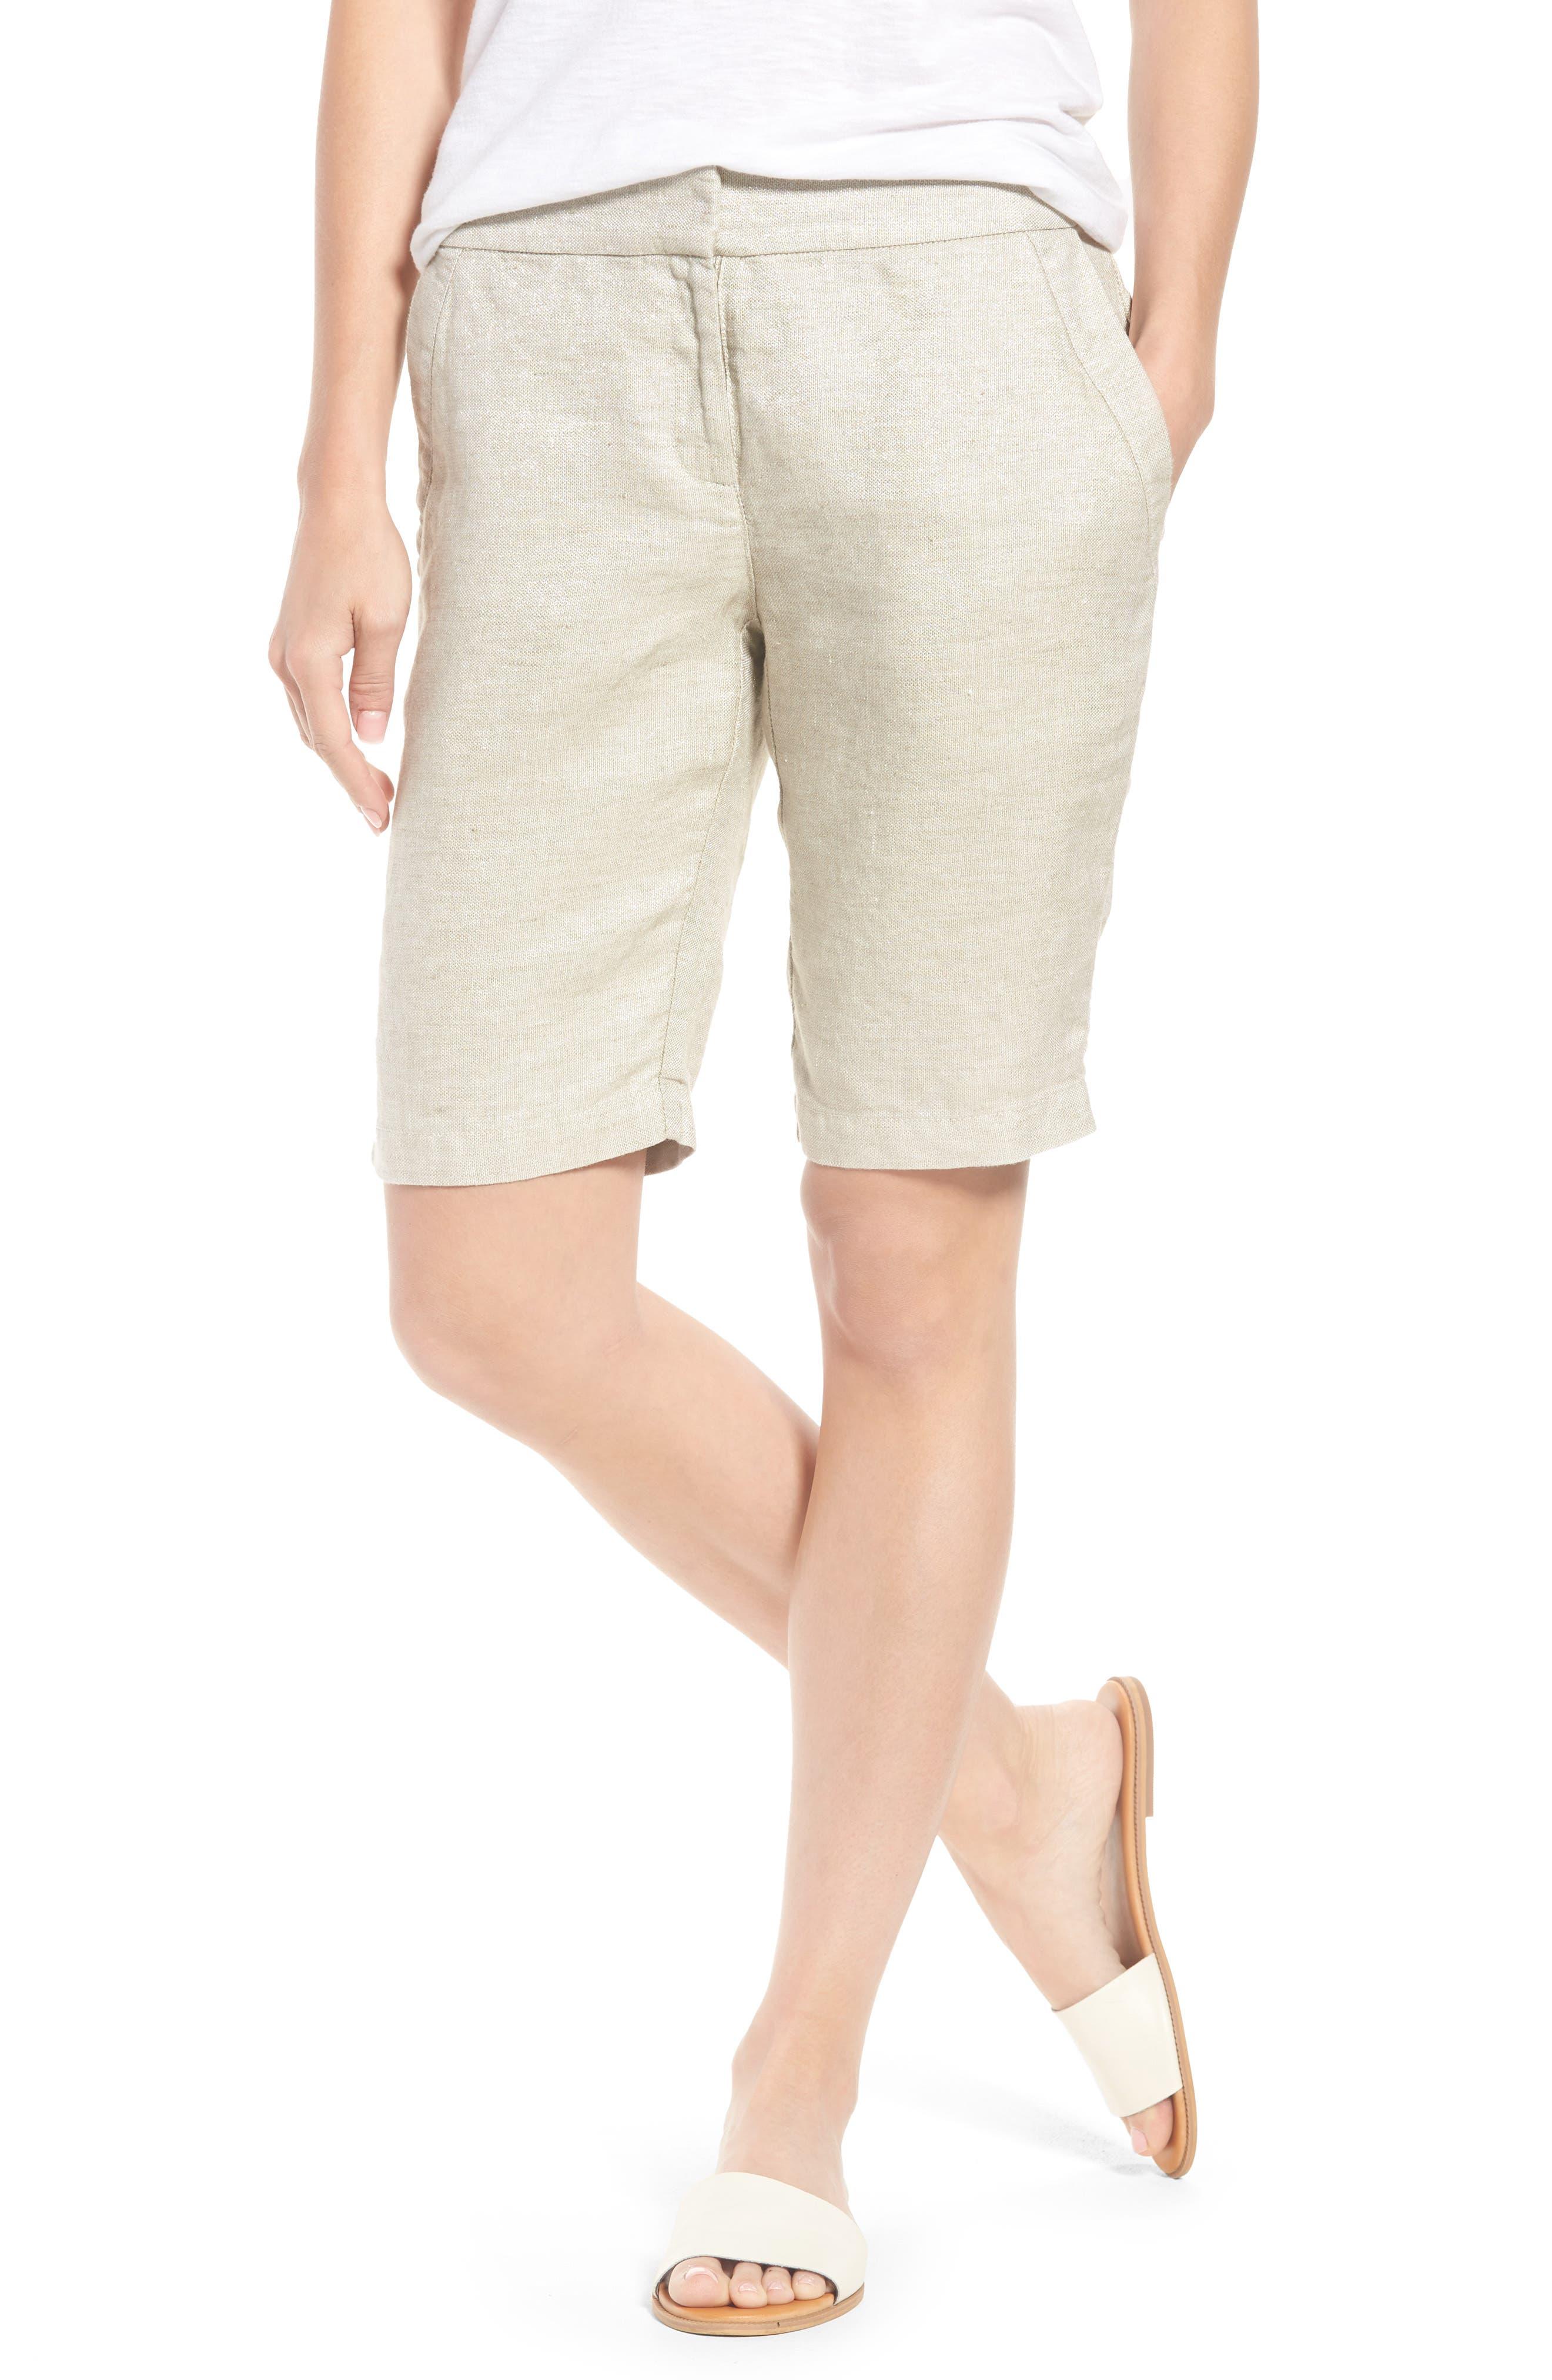 Organic Linen Blend Walking Shorts,                             Main thumbnail 1, color,                             257